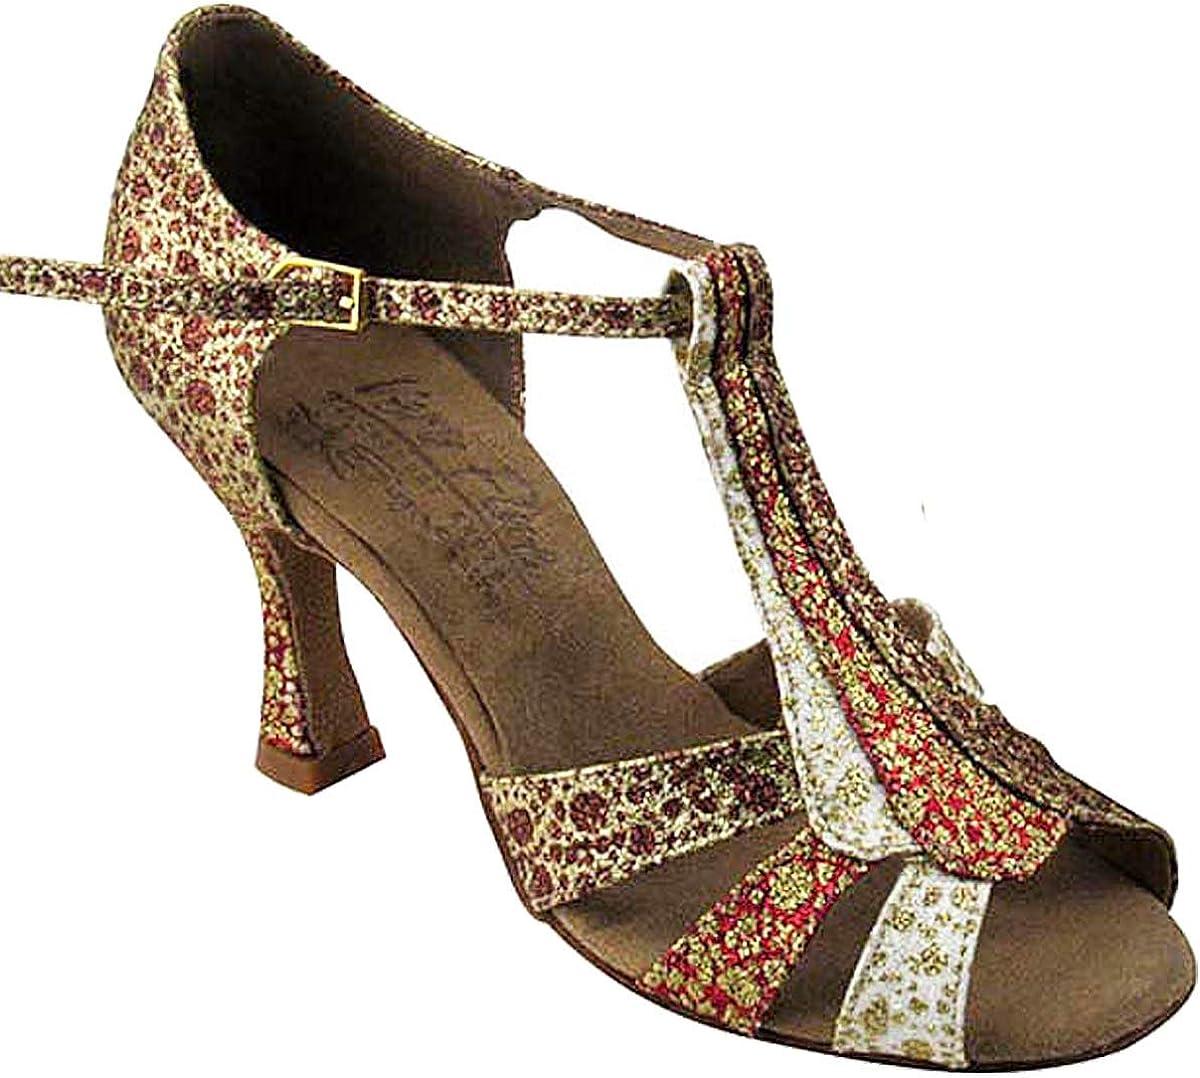 Women's Ballroom Dance Shoes Tango Wedding Salsa Shoes S2806EB Comfortable-Very Fine 3